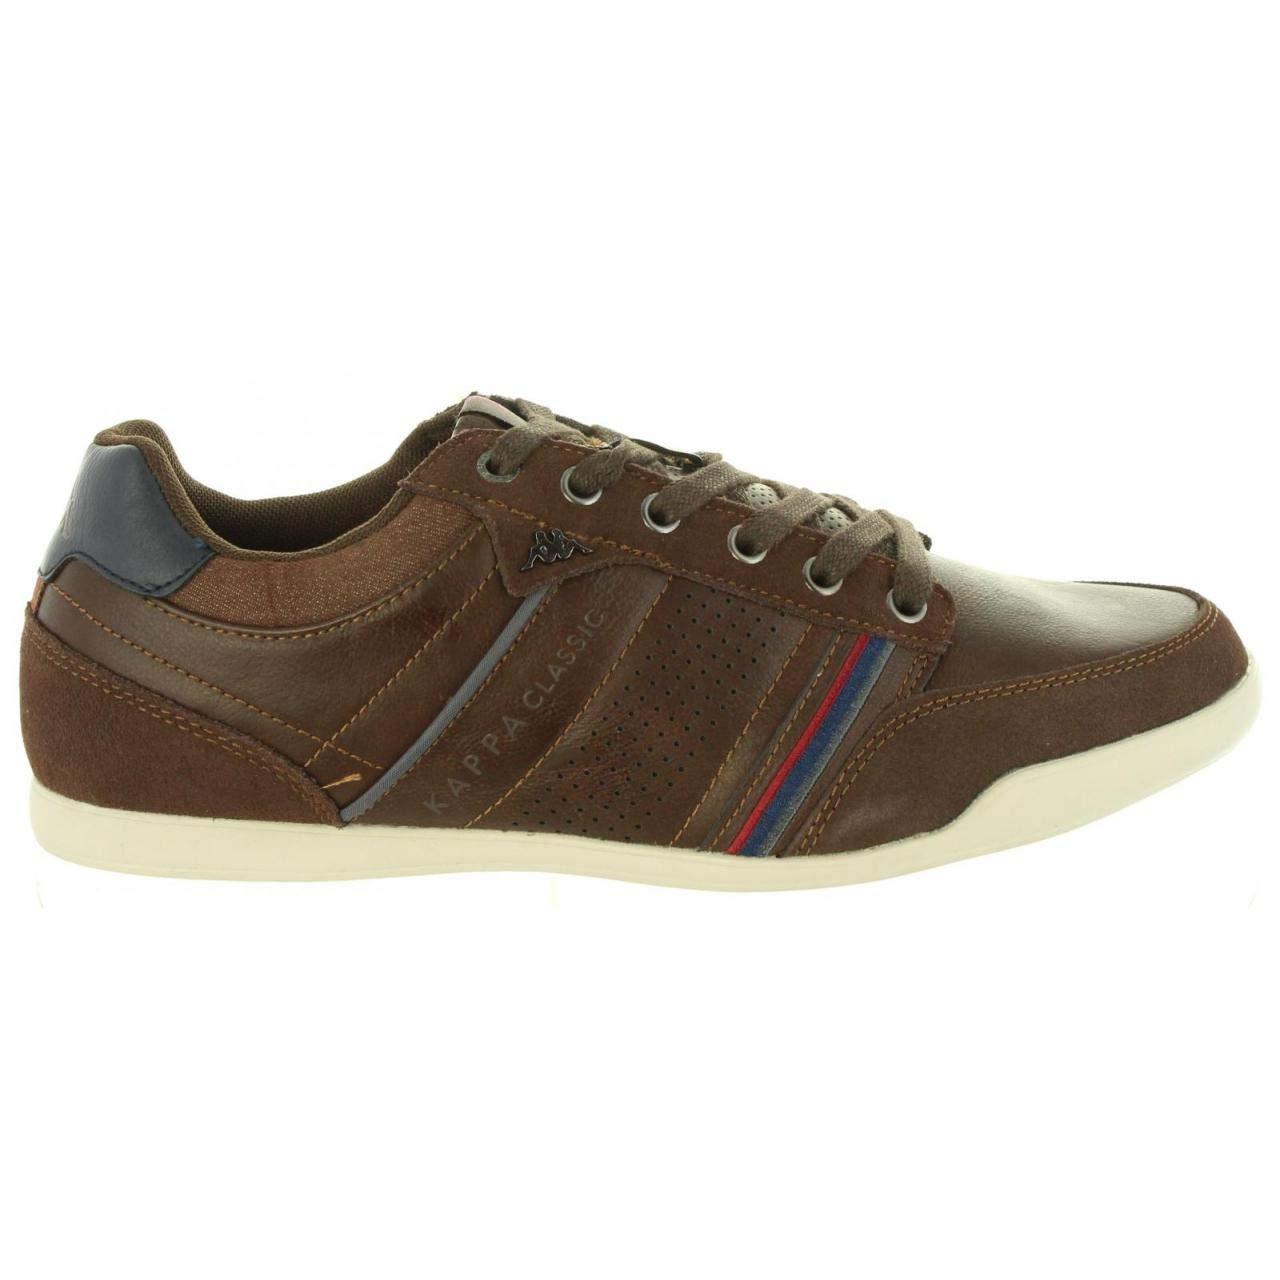 Kappa Chaussures pour Homme 303WBV0 SAWATI 912 DK Brown